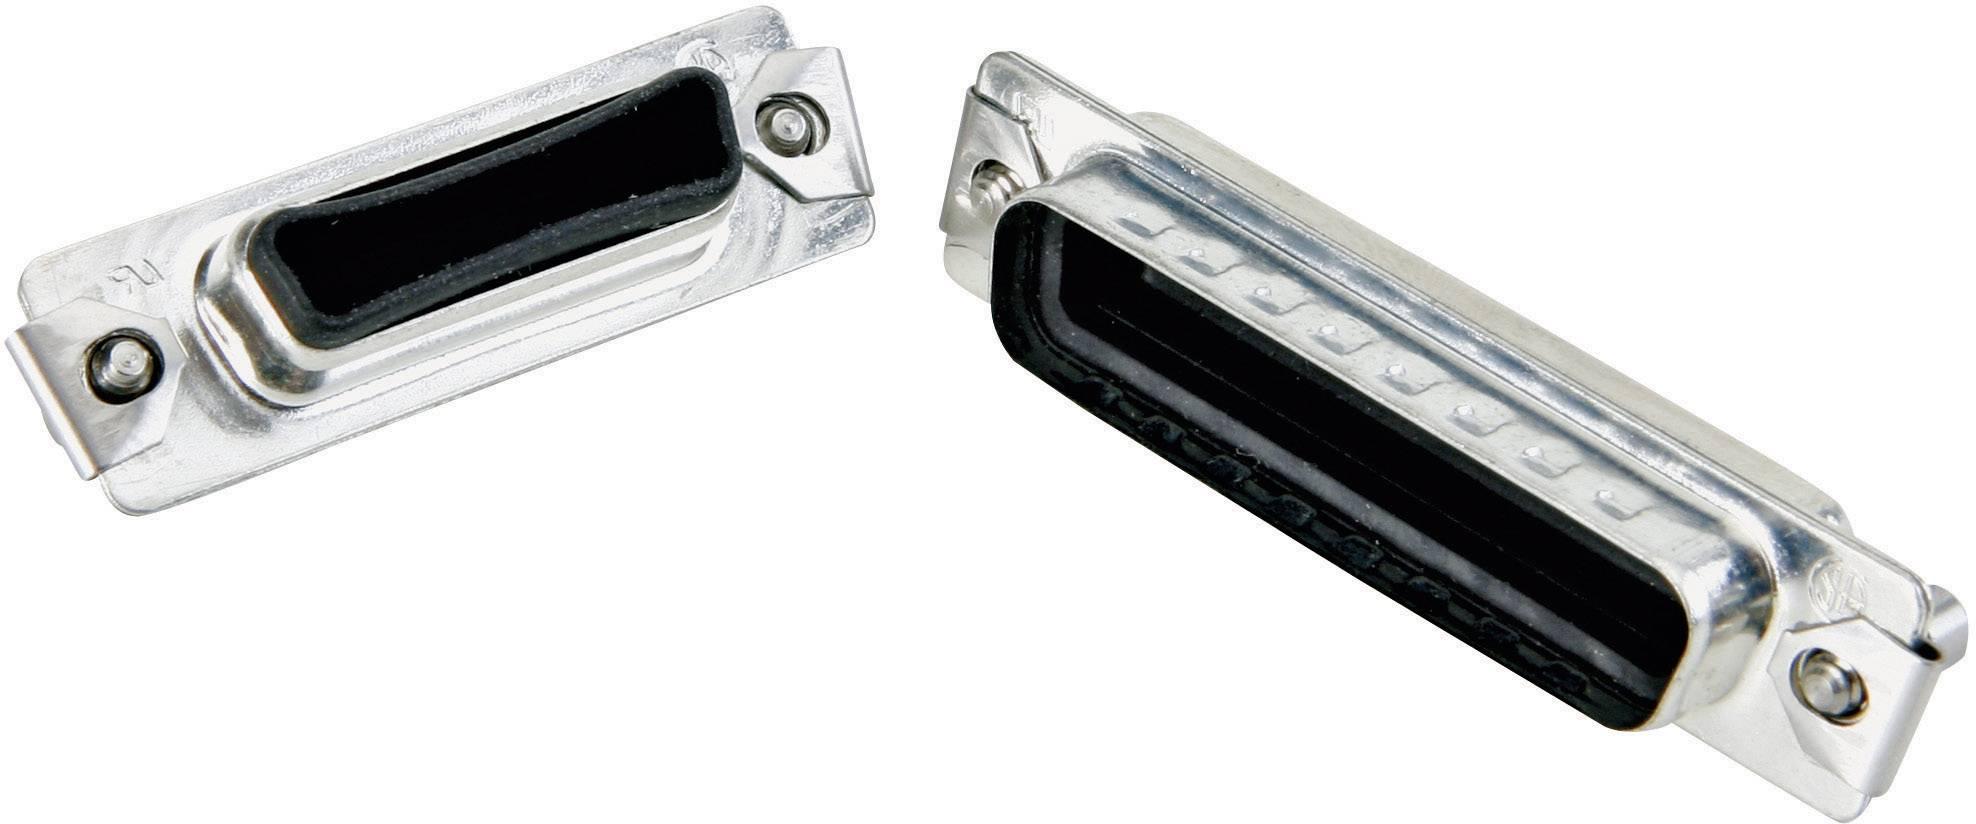 D-SUB krytka IP67 Conec 165X14729X, strieborná, 1 ks